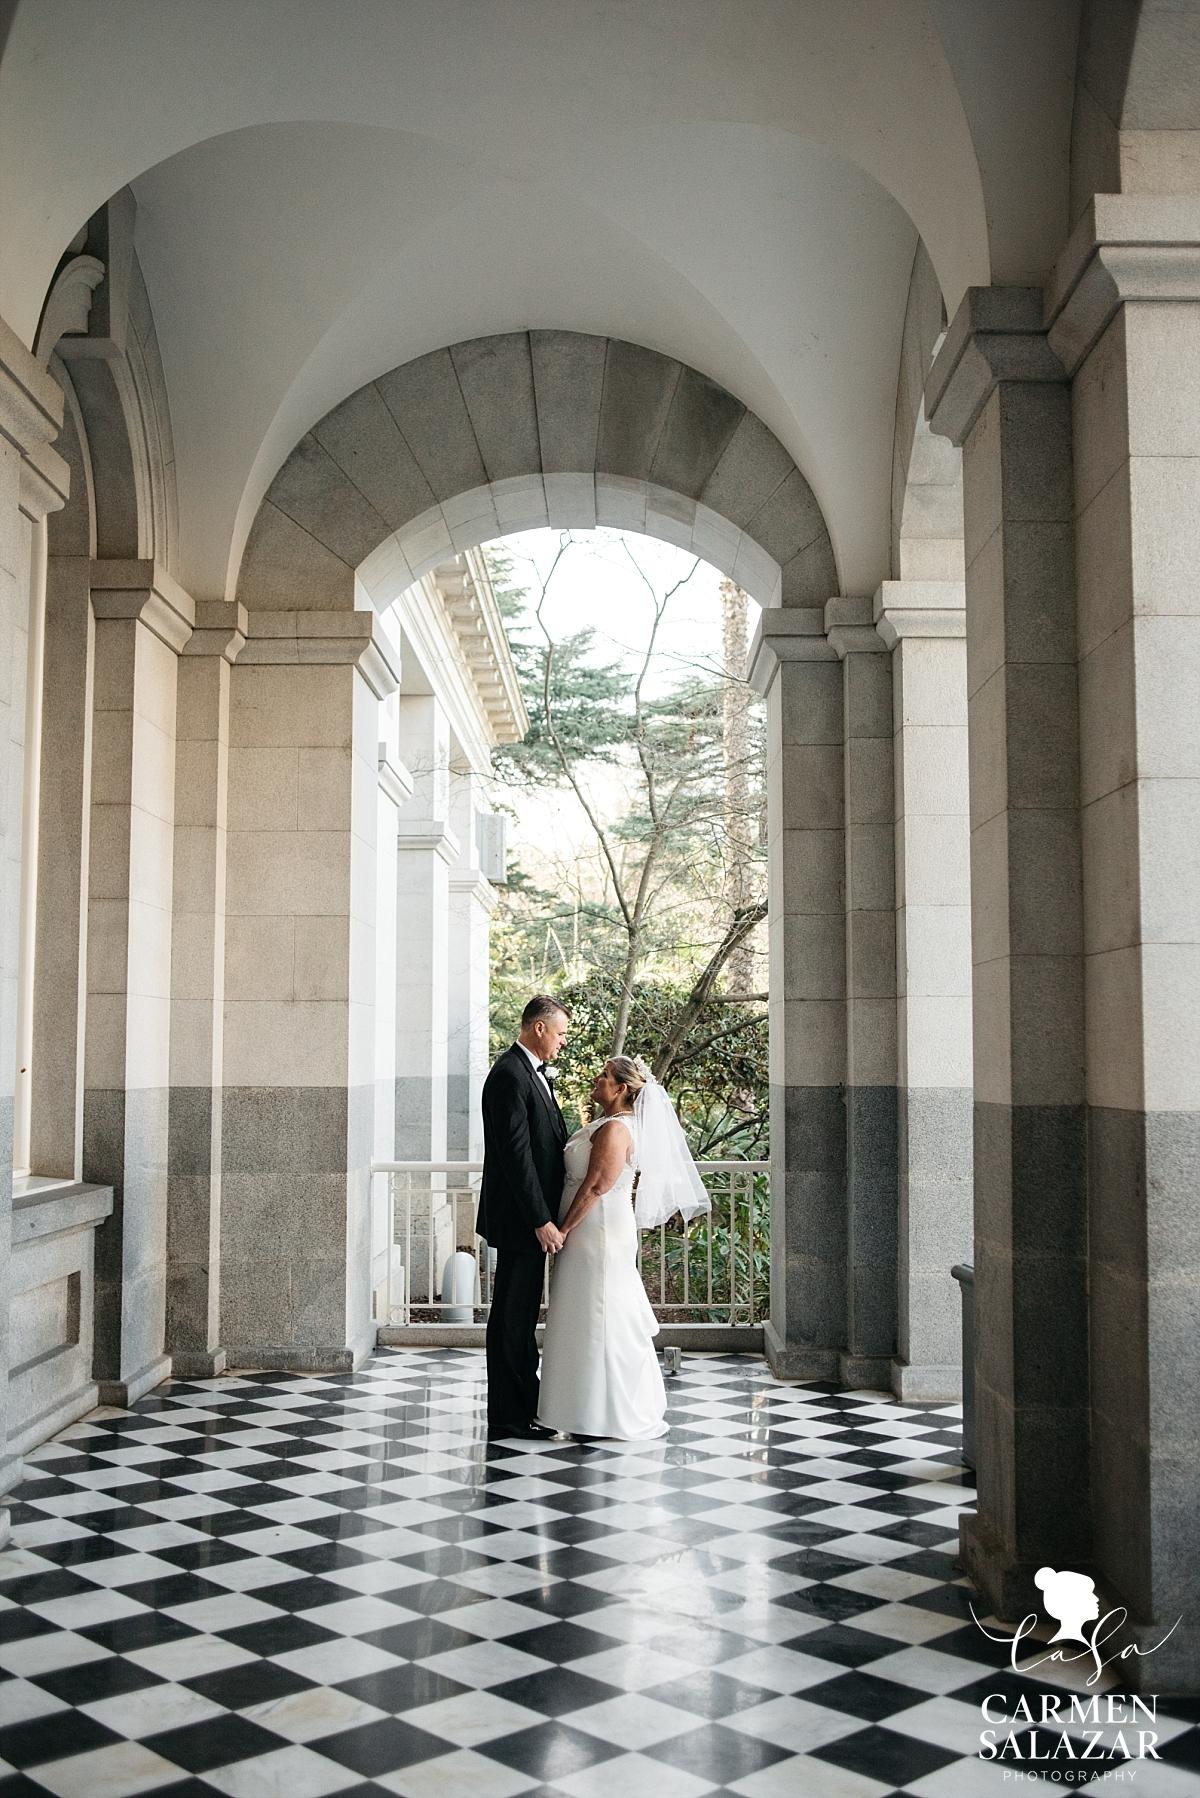 State Capitol bride and groom portraits - Carmen Salazar